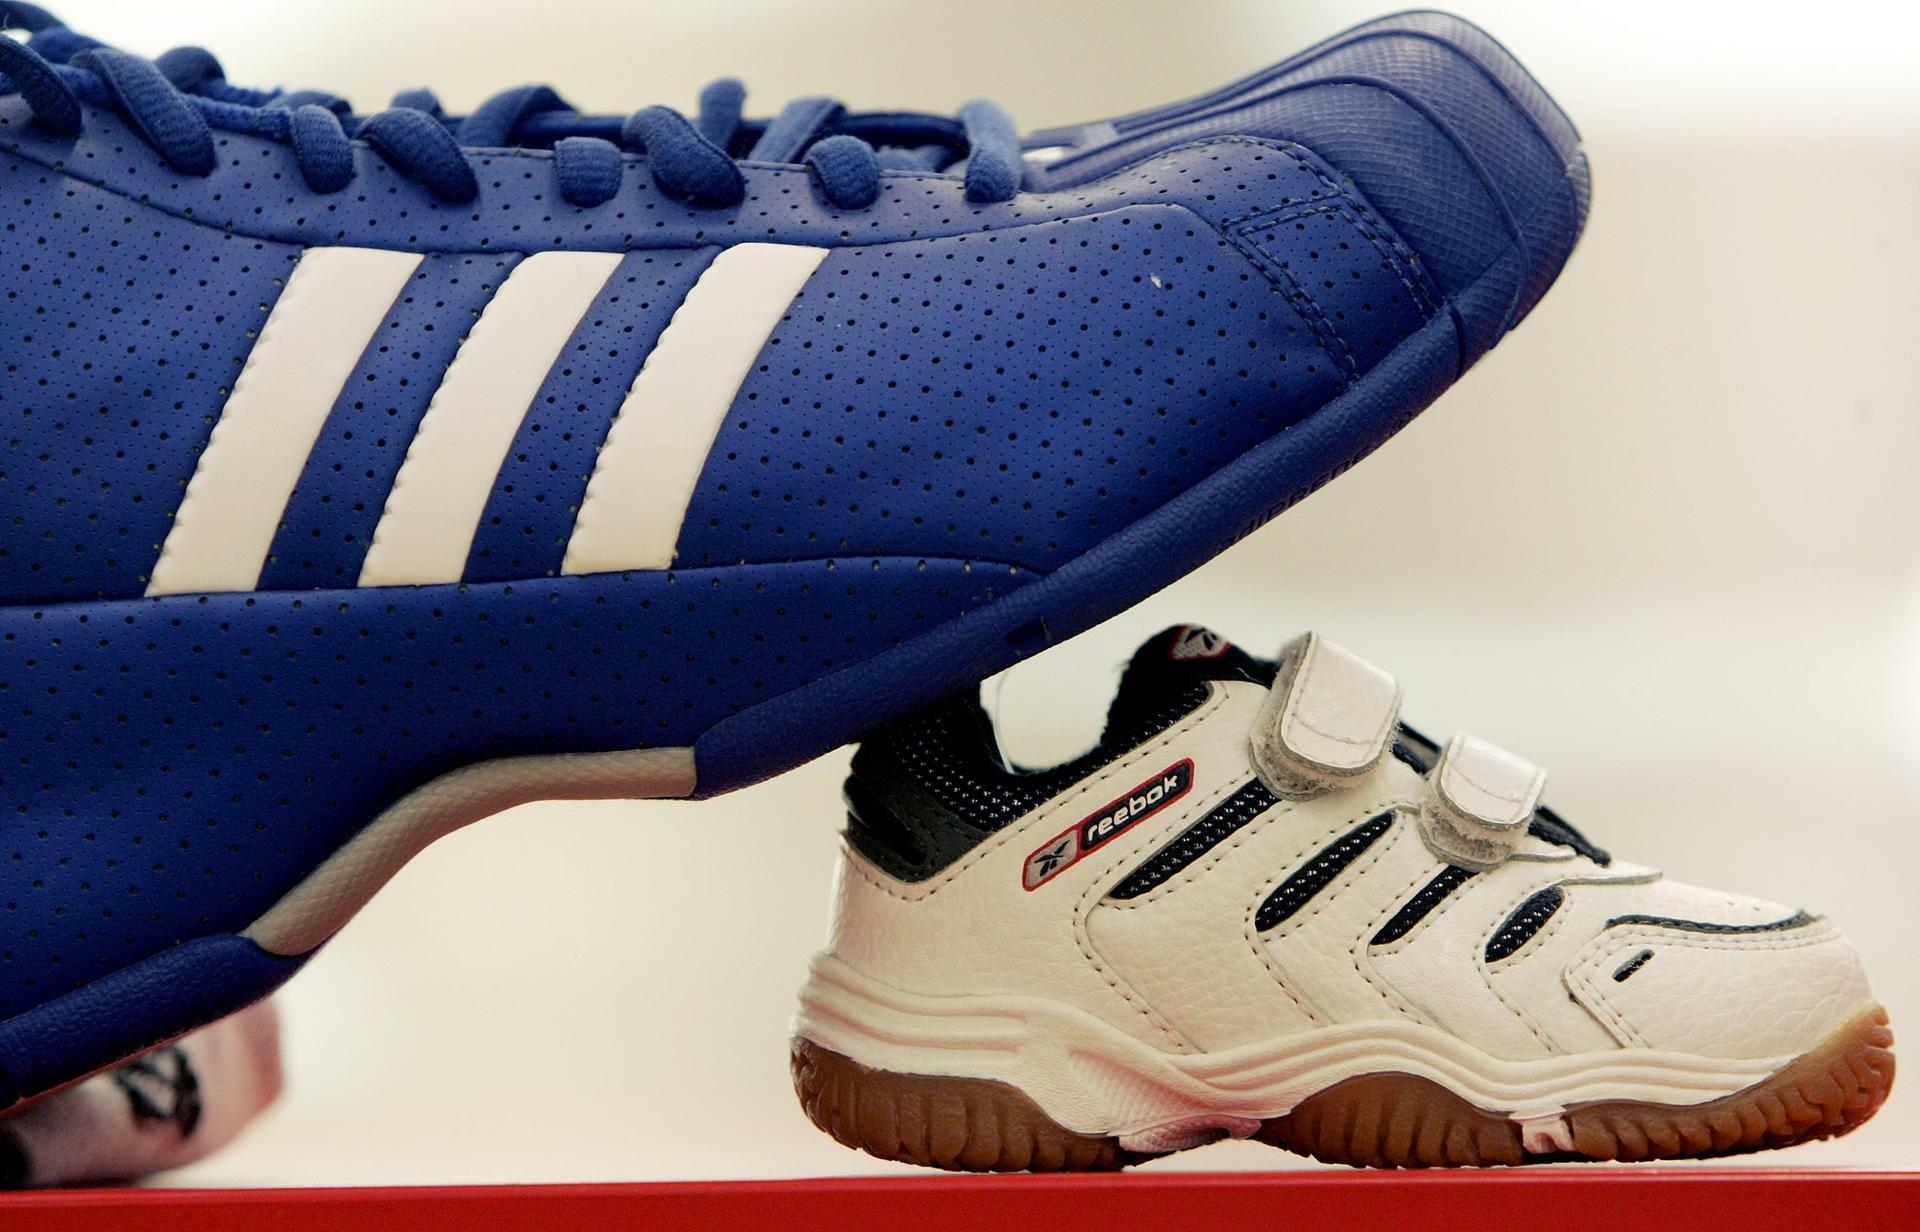 Sportartikel Adidas kauft Reebok